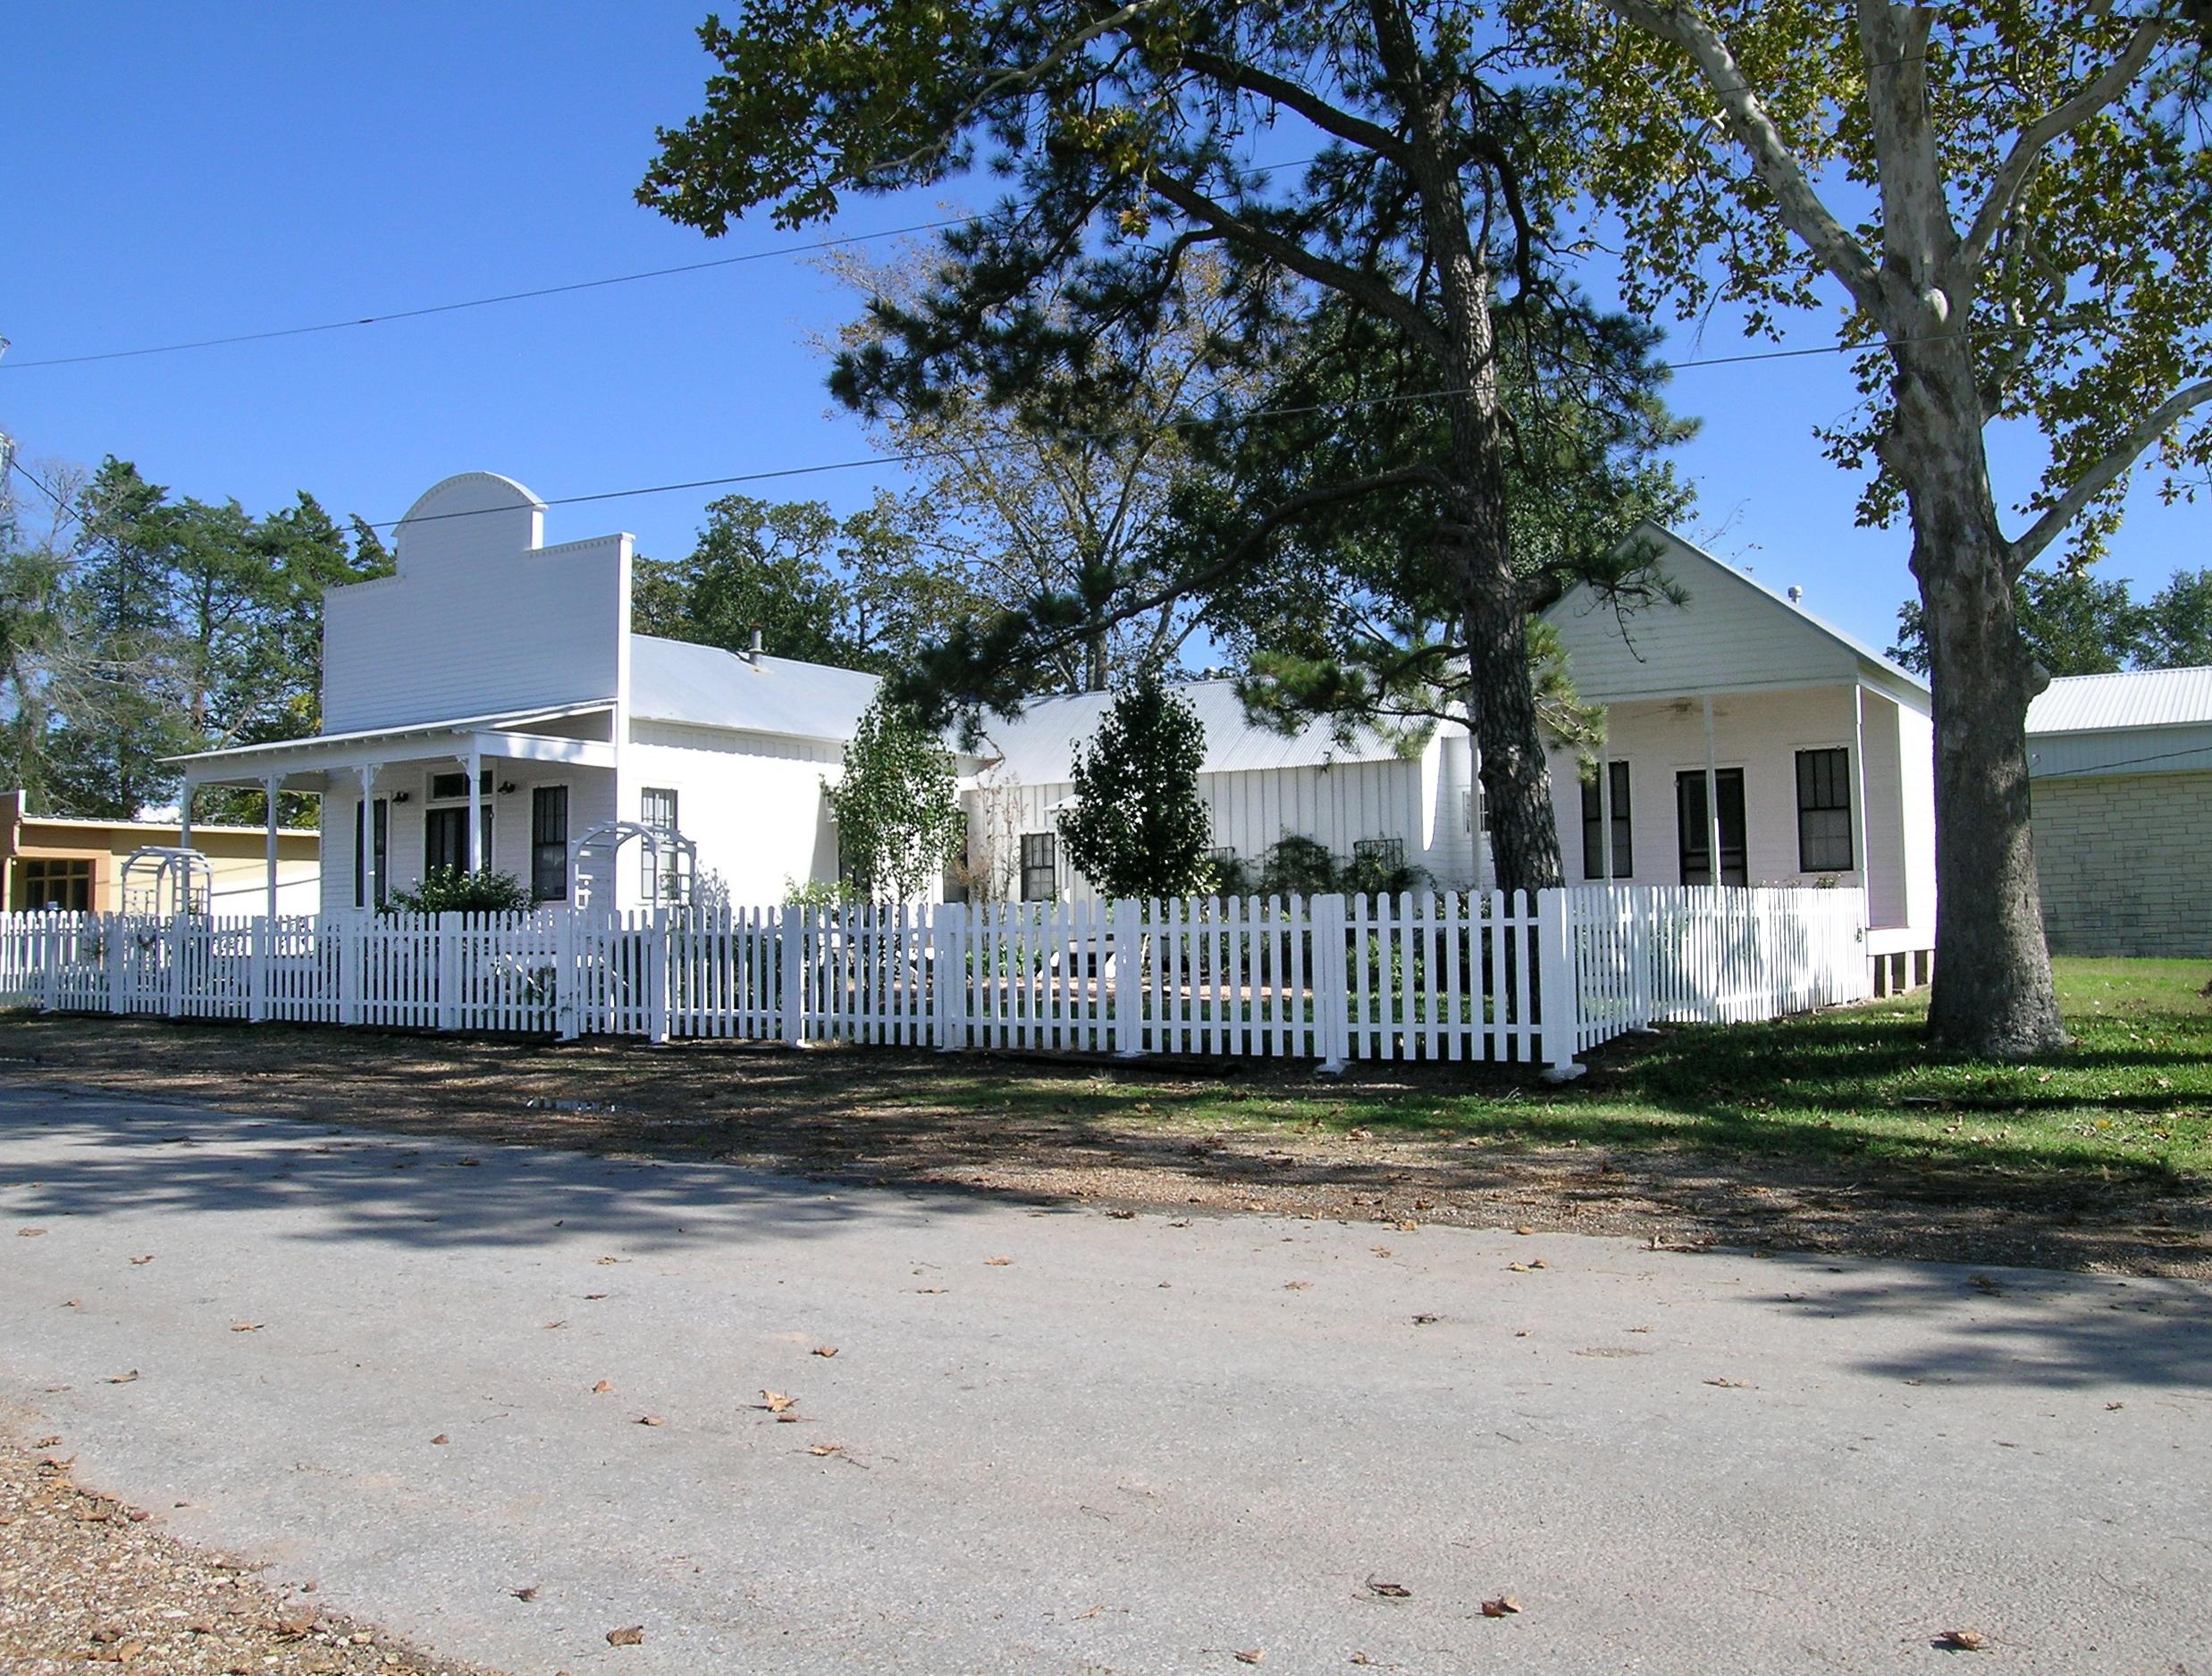 New Ulm Texas Historic Austin County In Texas